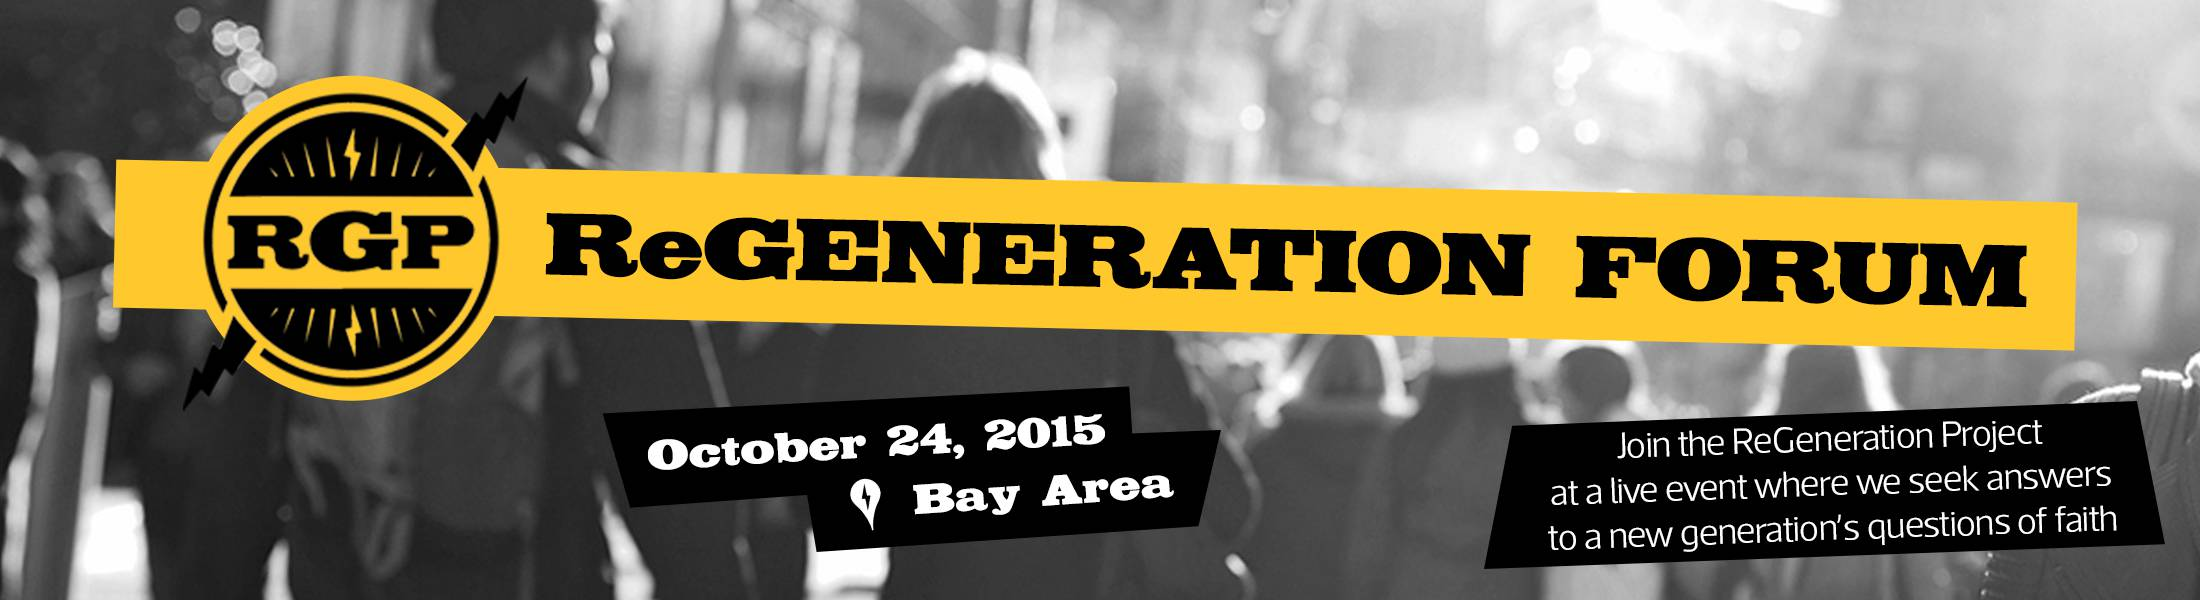 ReGeneration Forum 2015 - San Jose